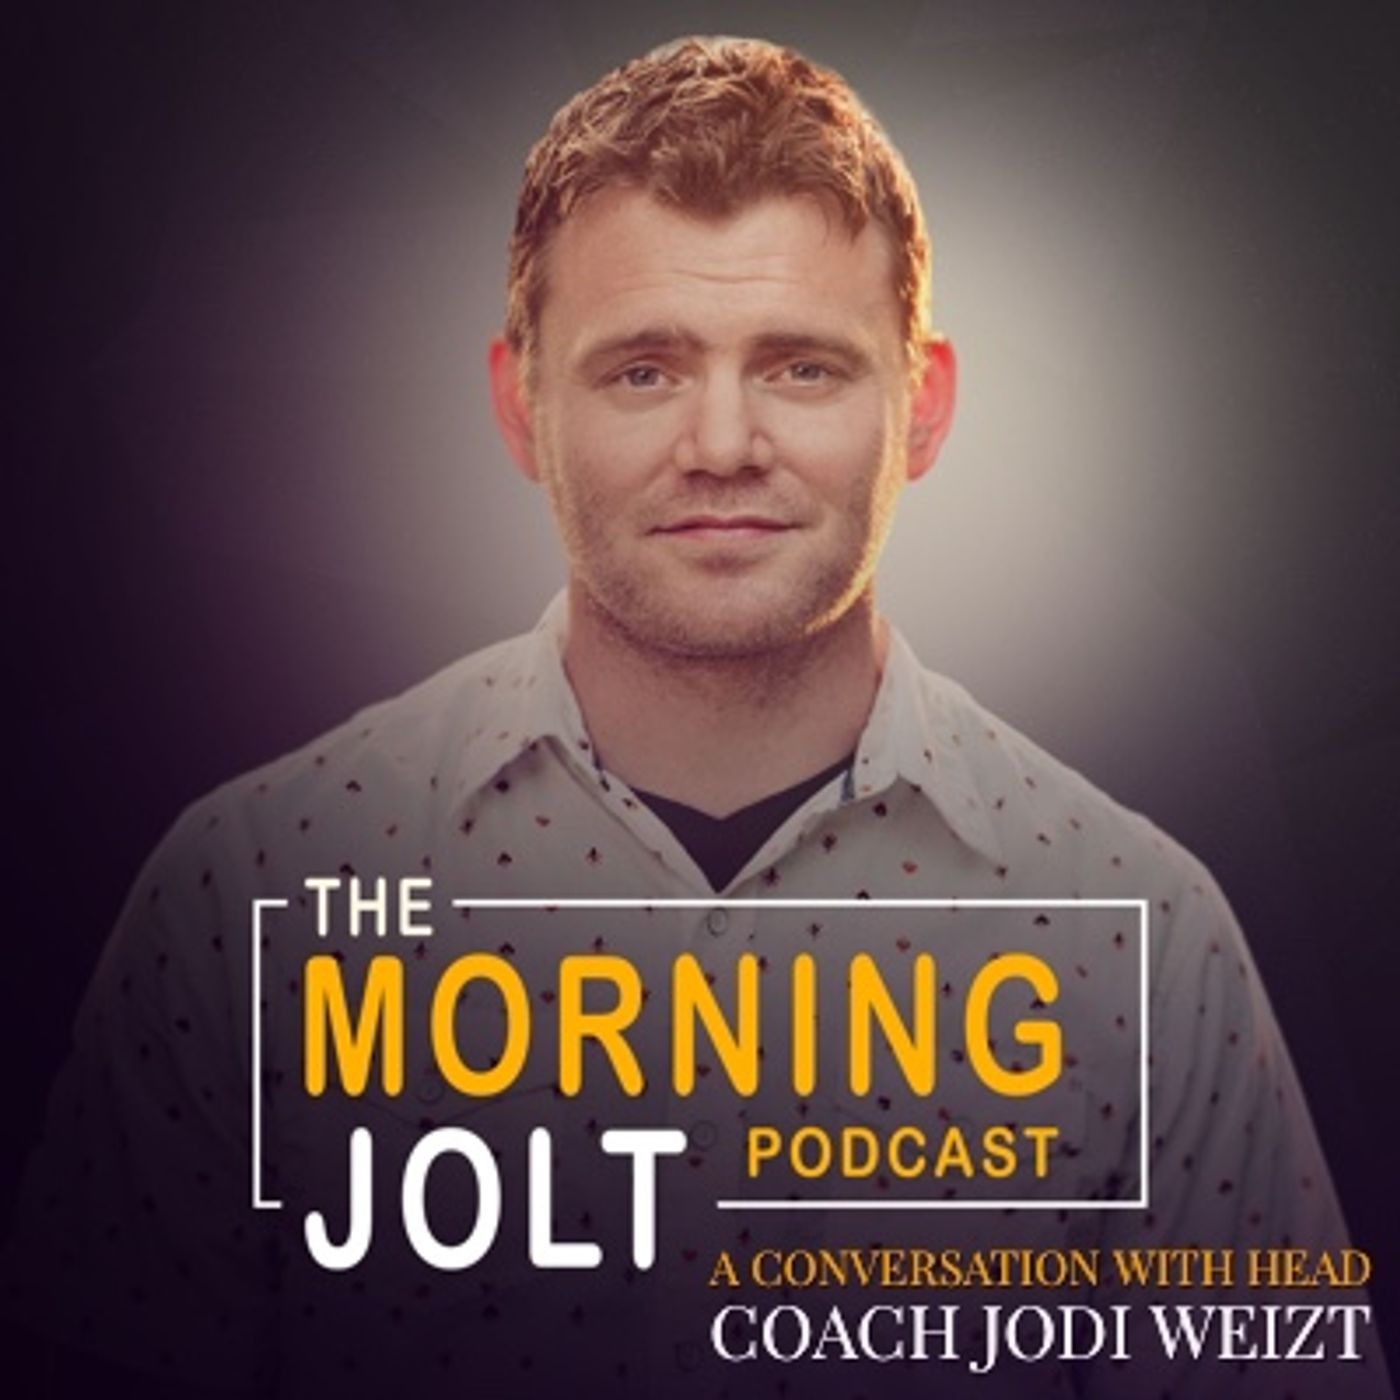 Always Take Time to Reset - Conversation with Head Coach Jodi Weitzeil